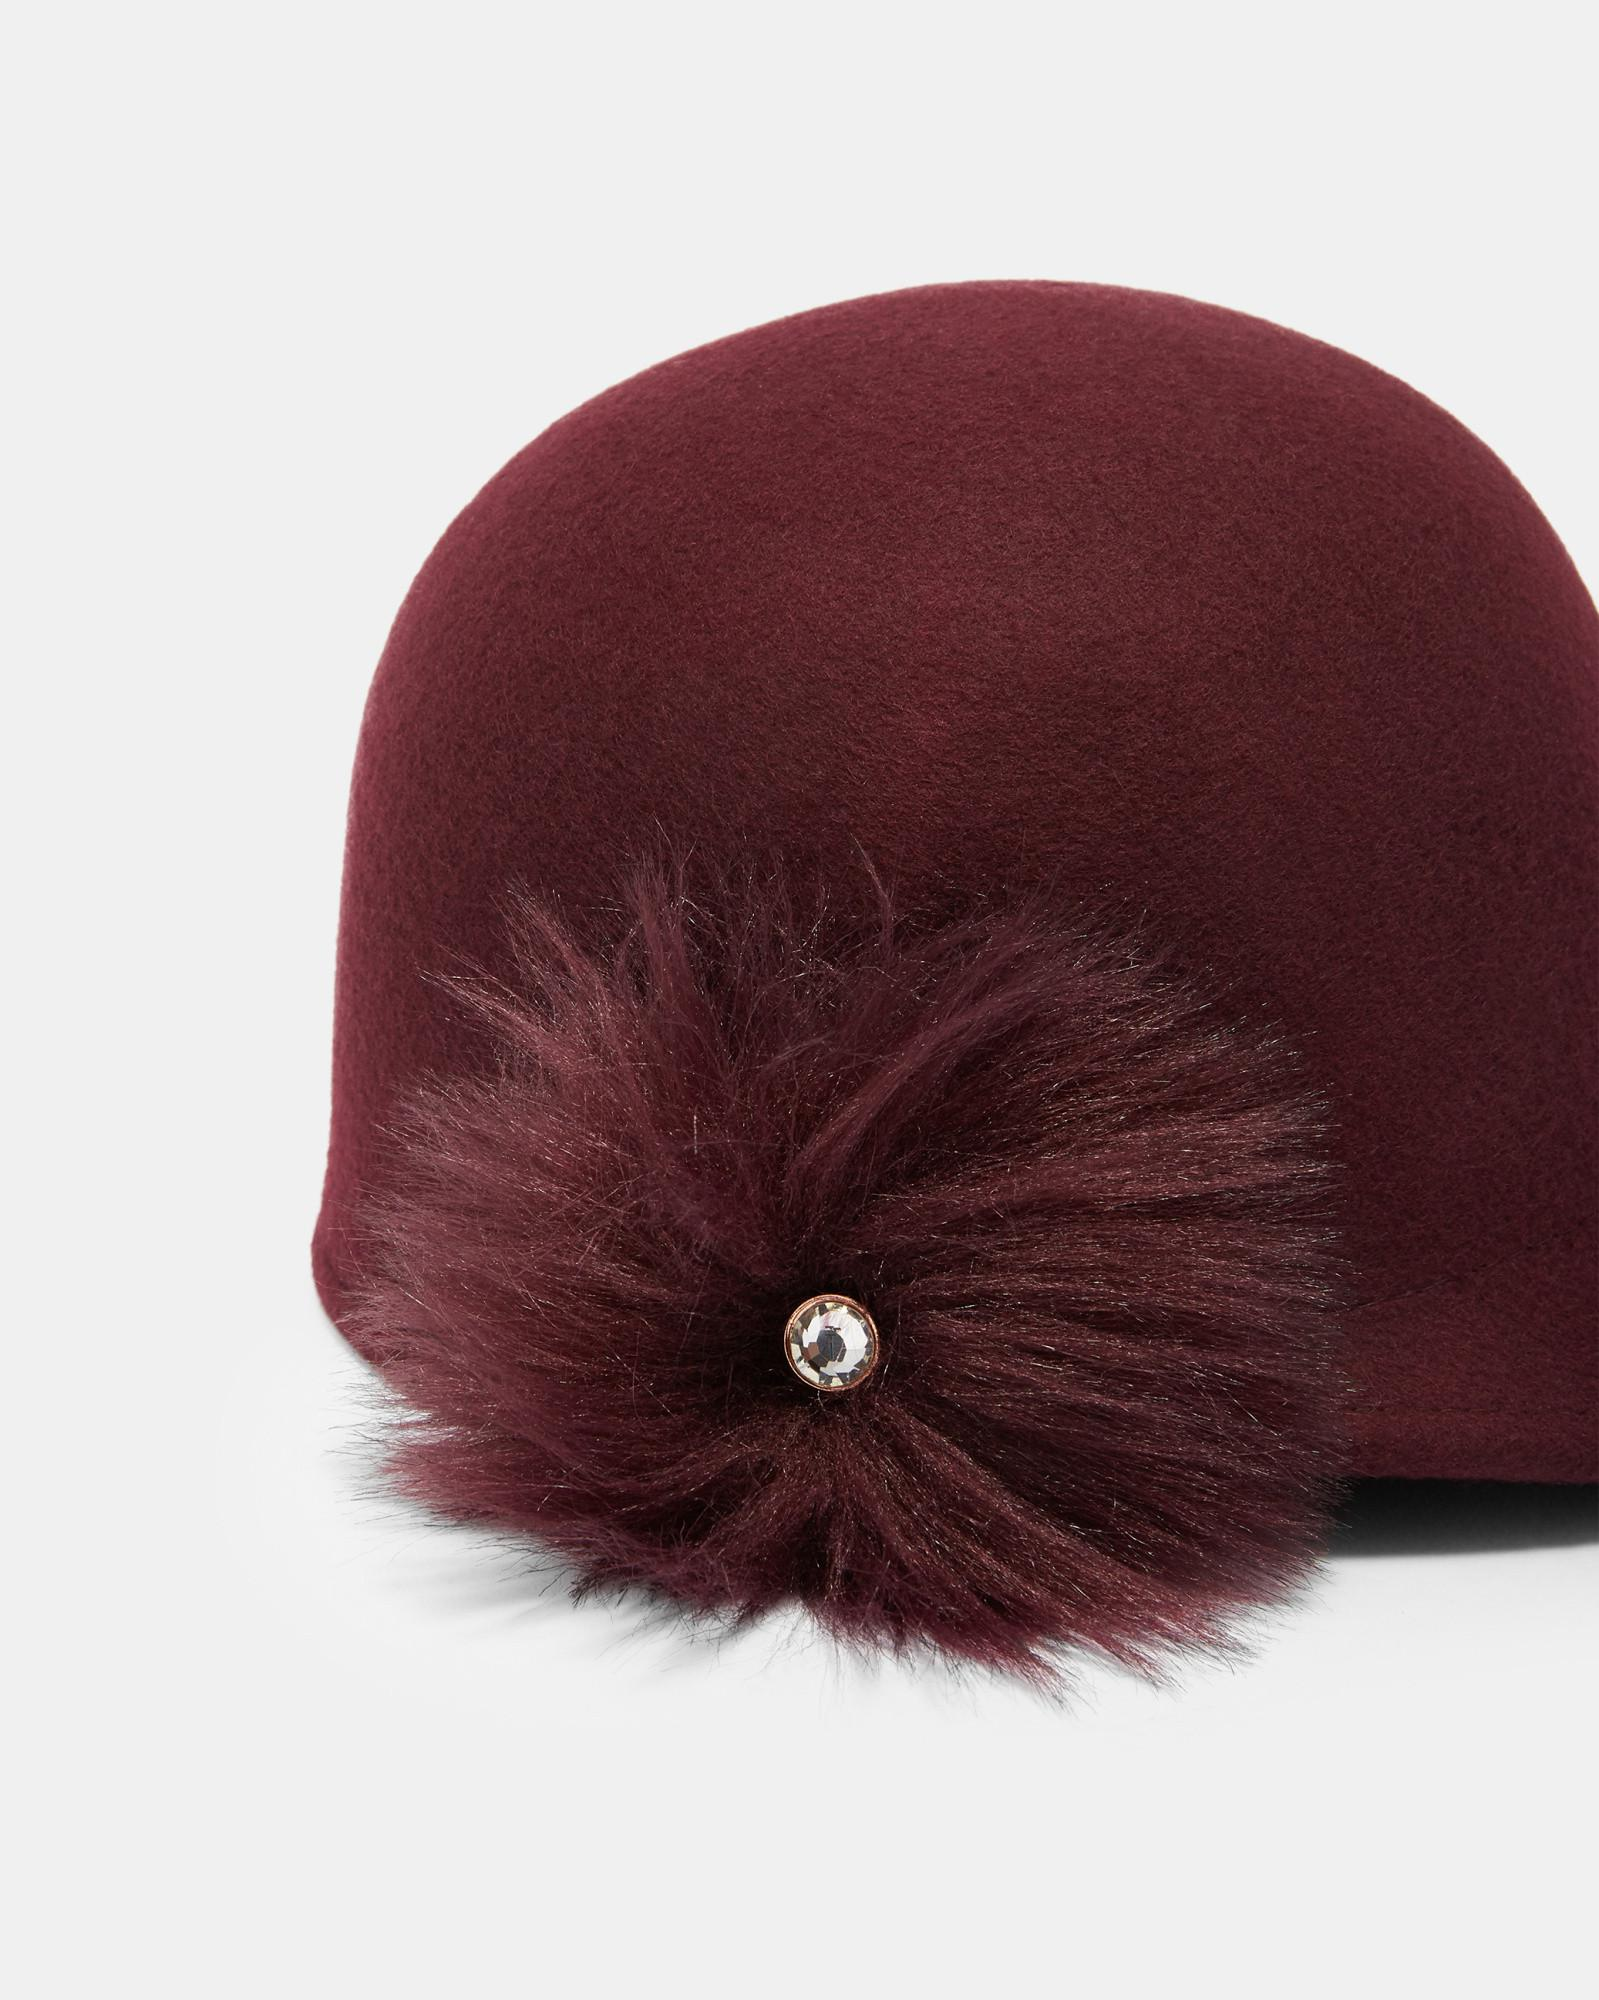 Lyst - Ted Baker Faux Fur Pom Pom Felt Hat in Red bef0a0afa6e6